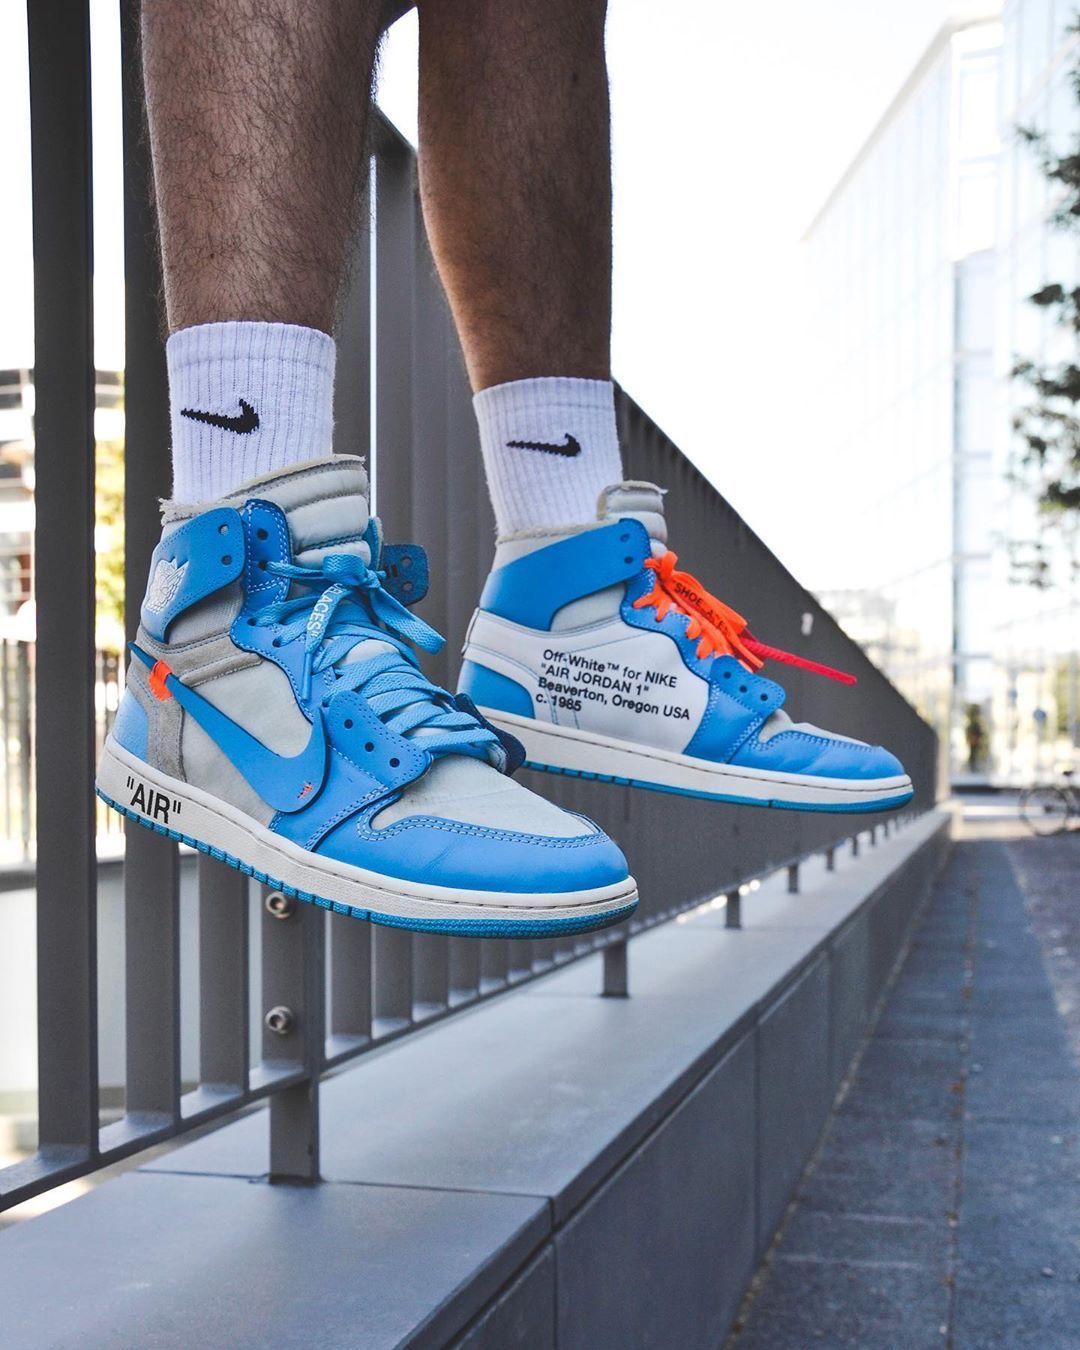 Jordan 1 Retro High Off White University Blue Jordan 1 Retro